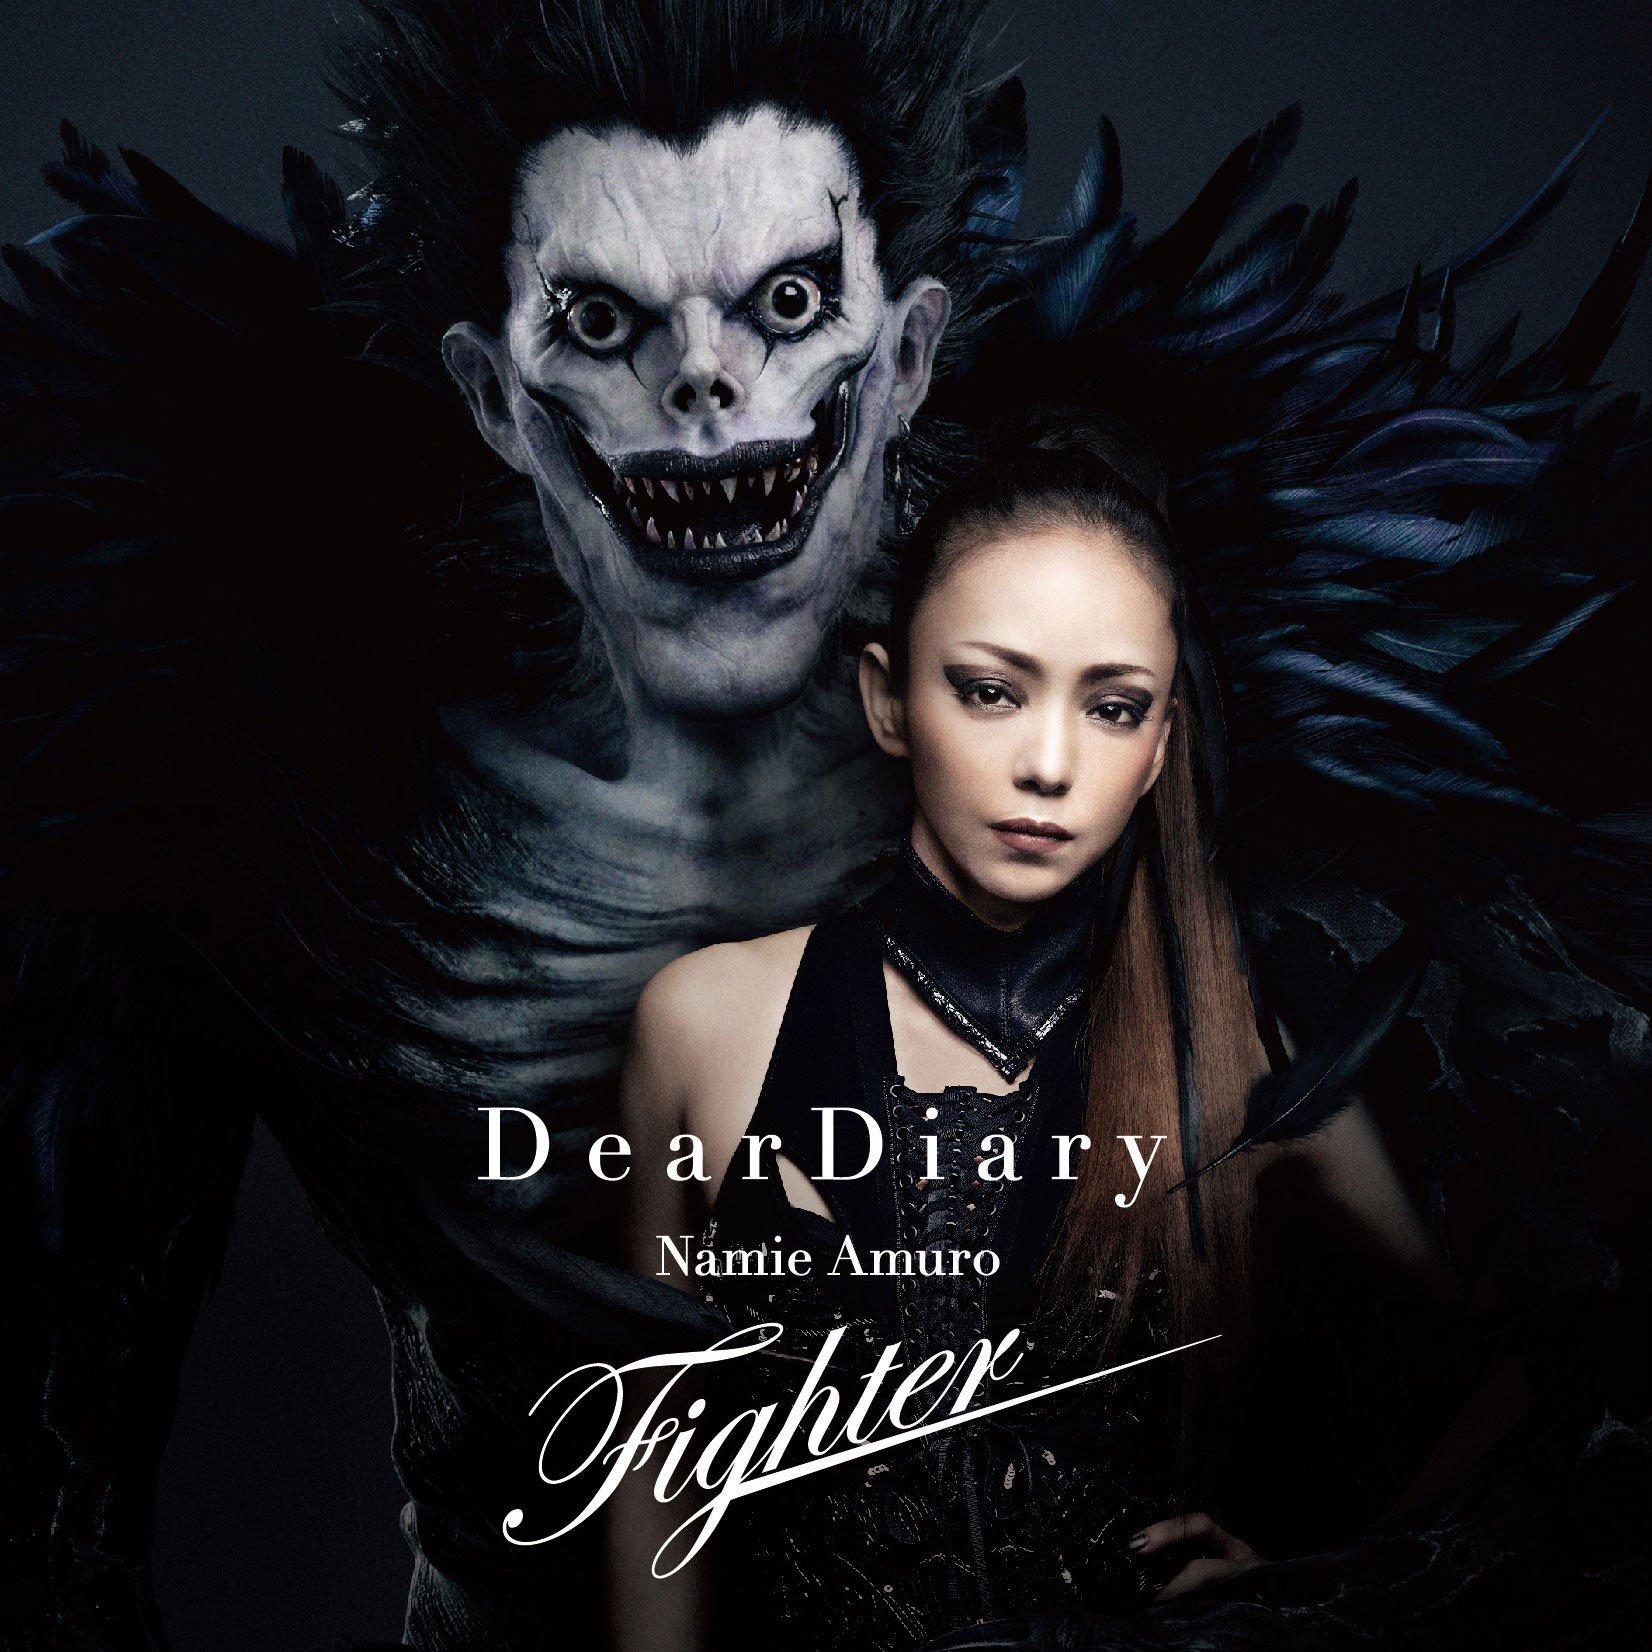 Namie Amuro - Dear Diary Fighter Death Note